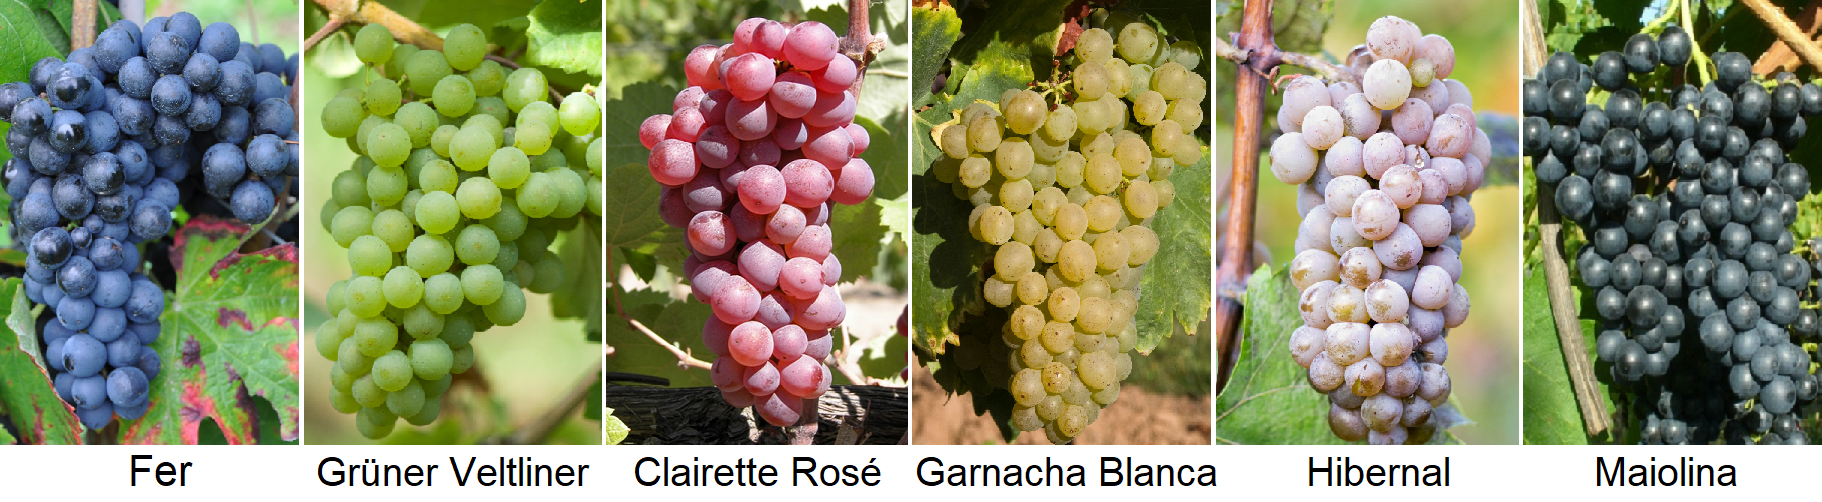 Grape Varieties - Fer, Grüner Veltliner, Clairette Rosé, Garnacha Blanca, Hibernal, Maiolina